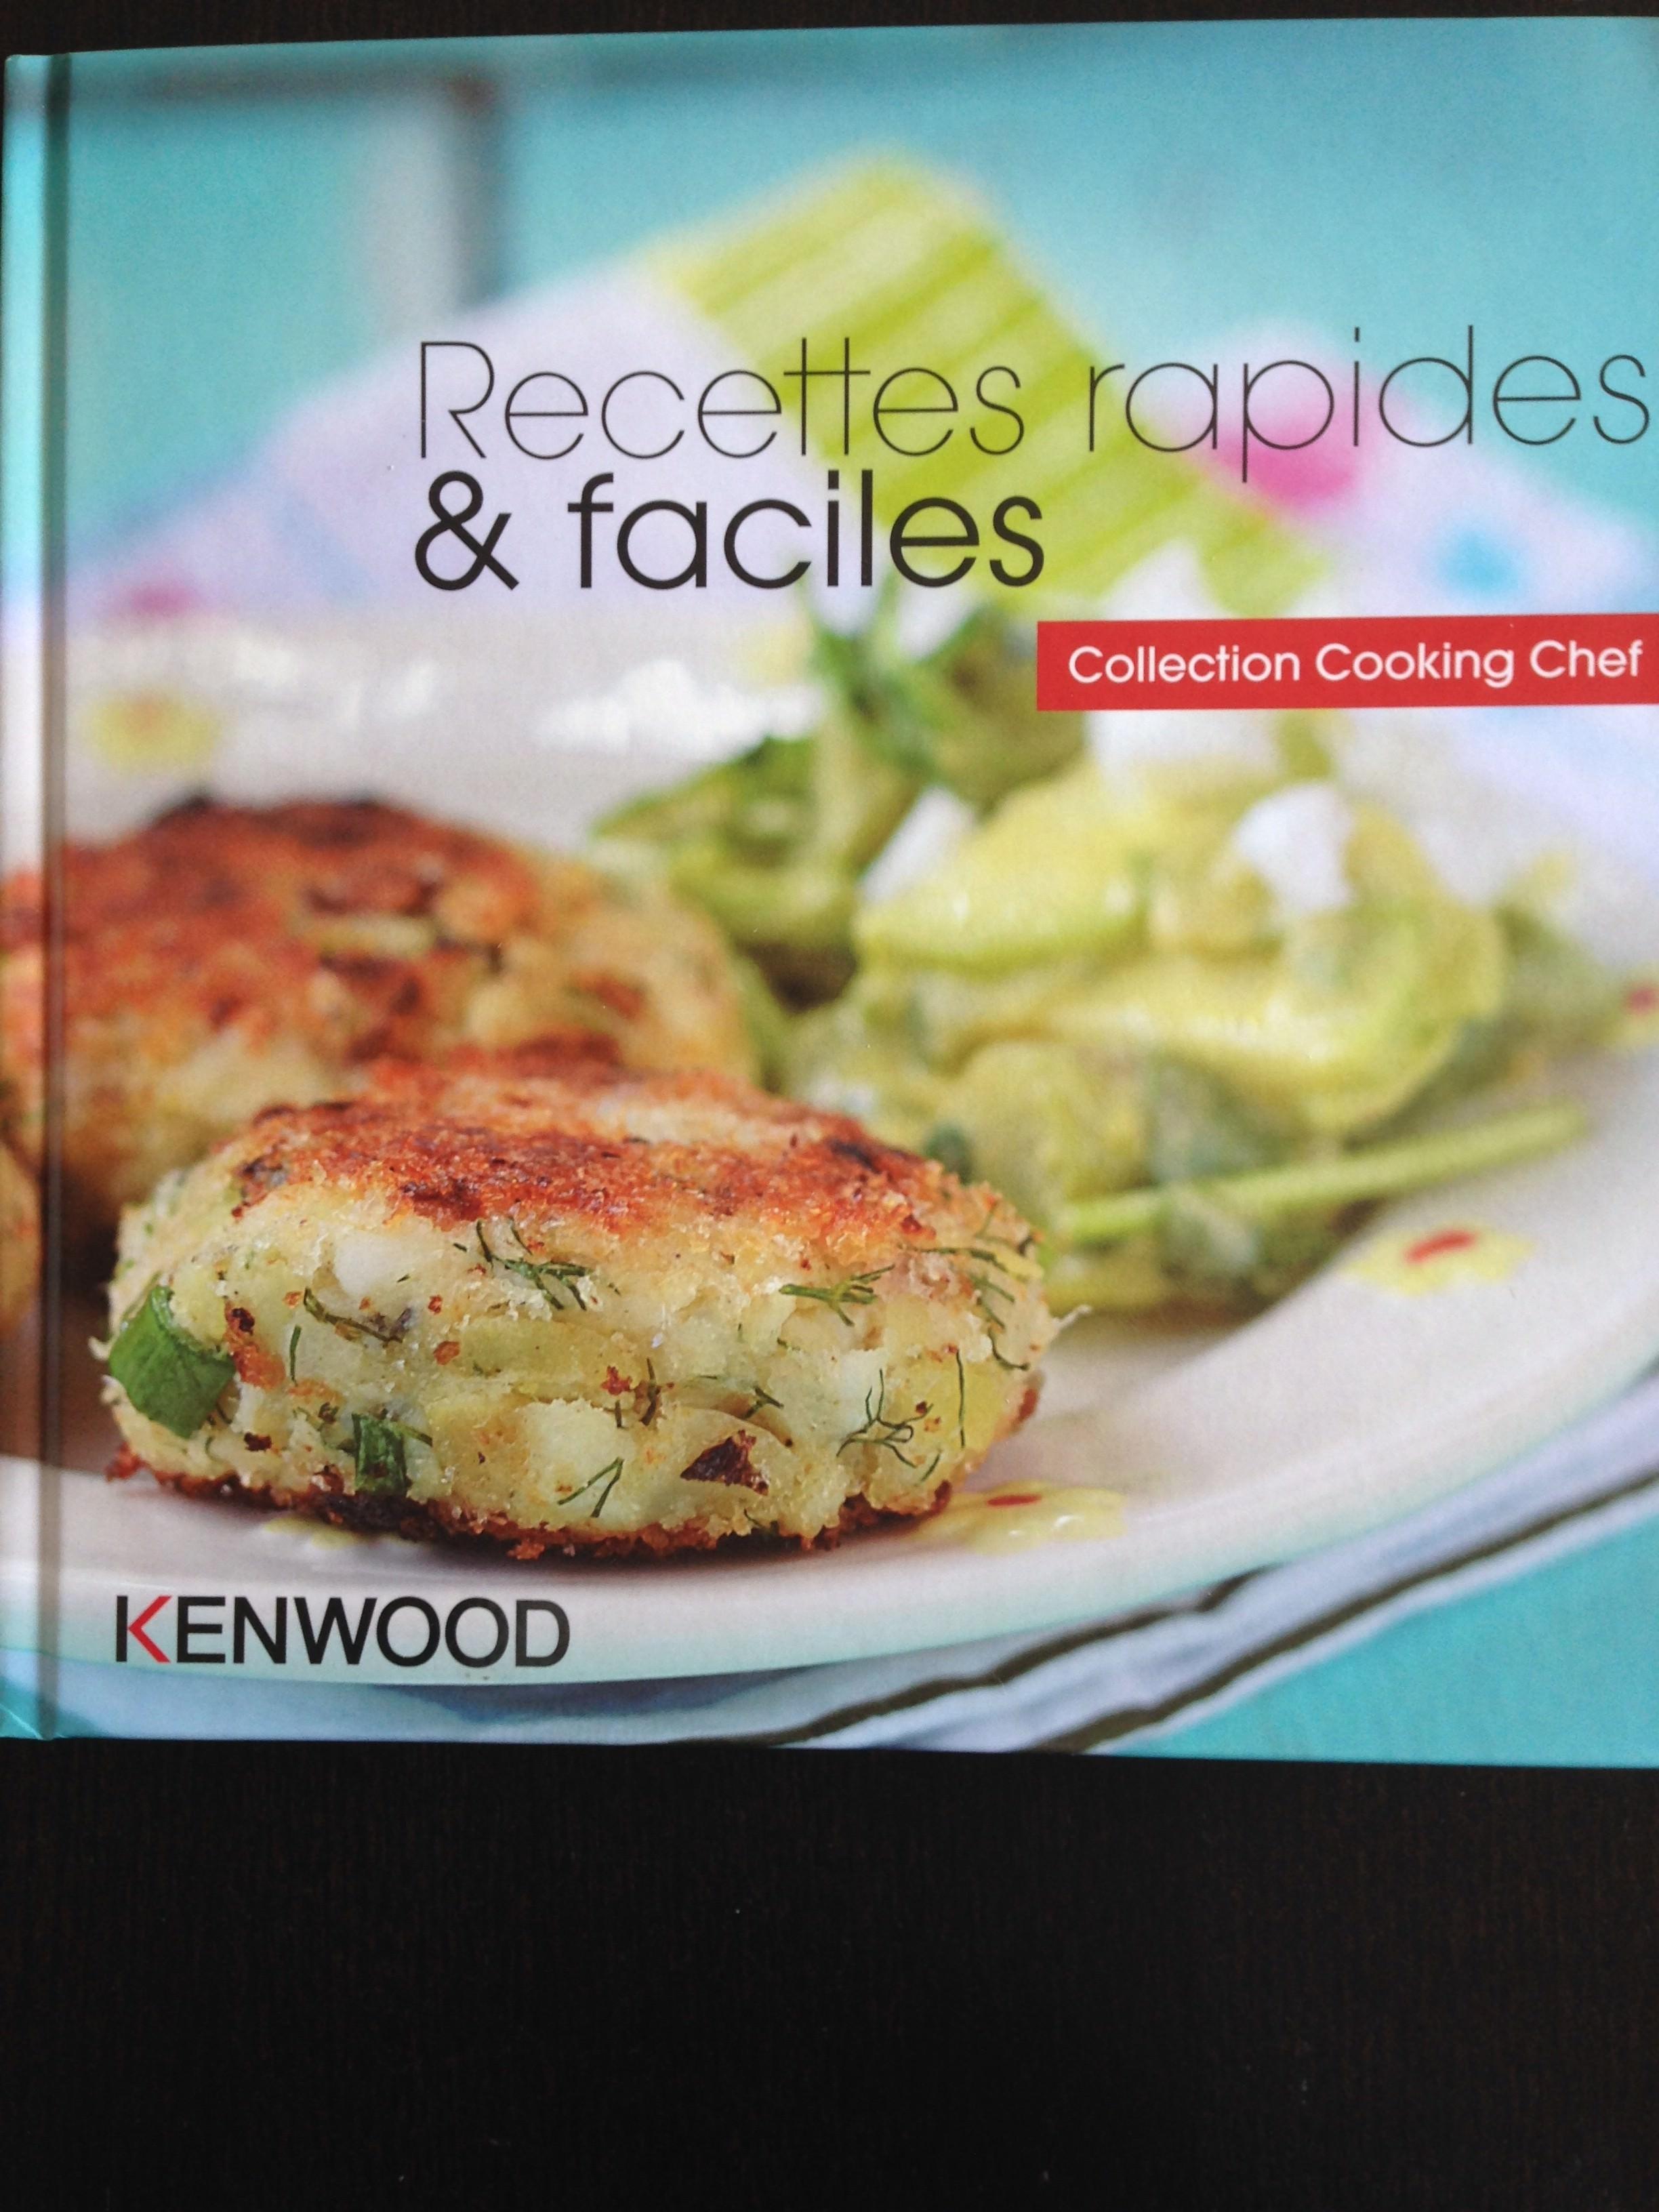 Recettes rapides et faciles collection cooking chef